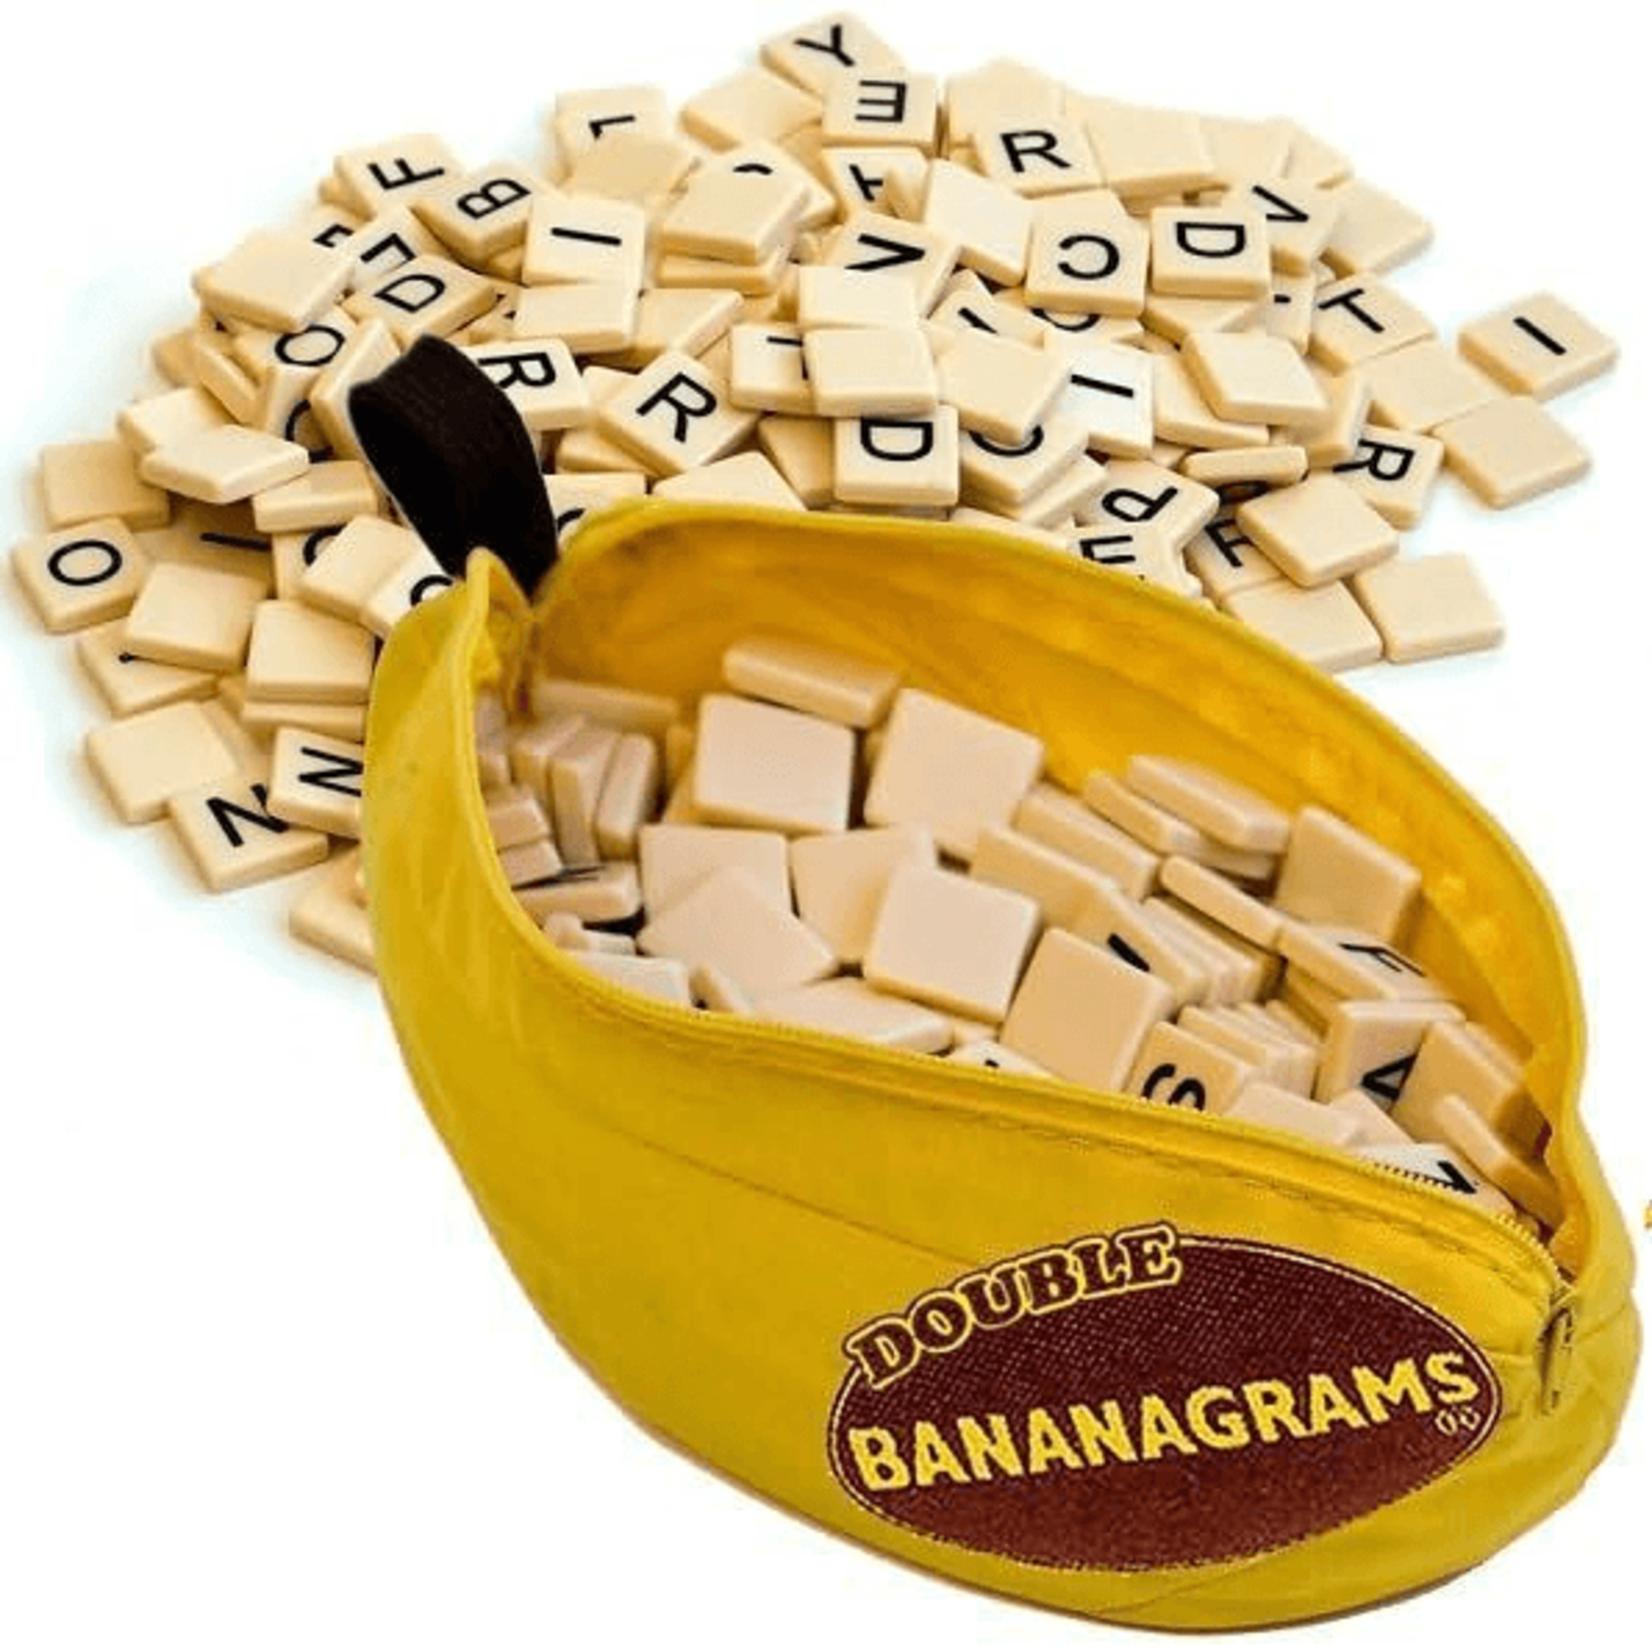 Bananagrams Bananagrams: Double